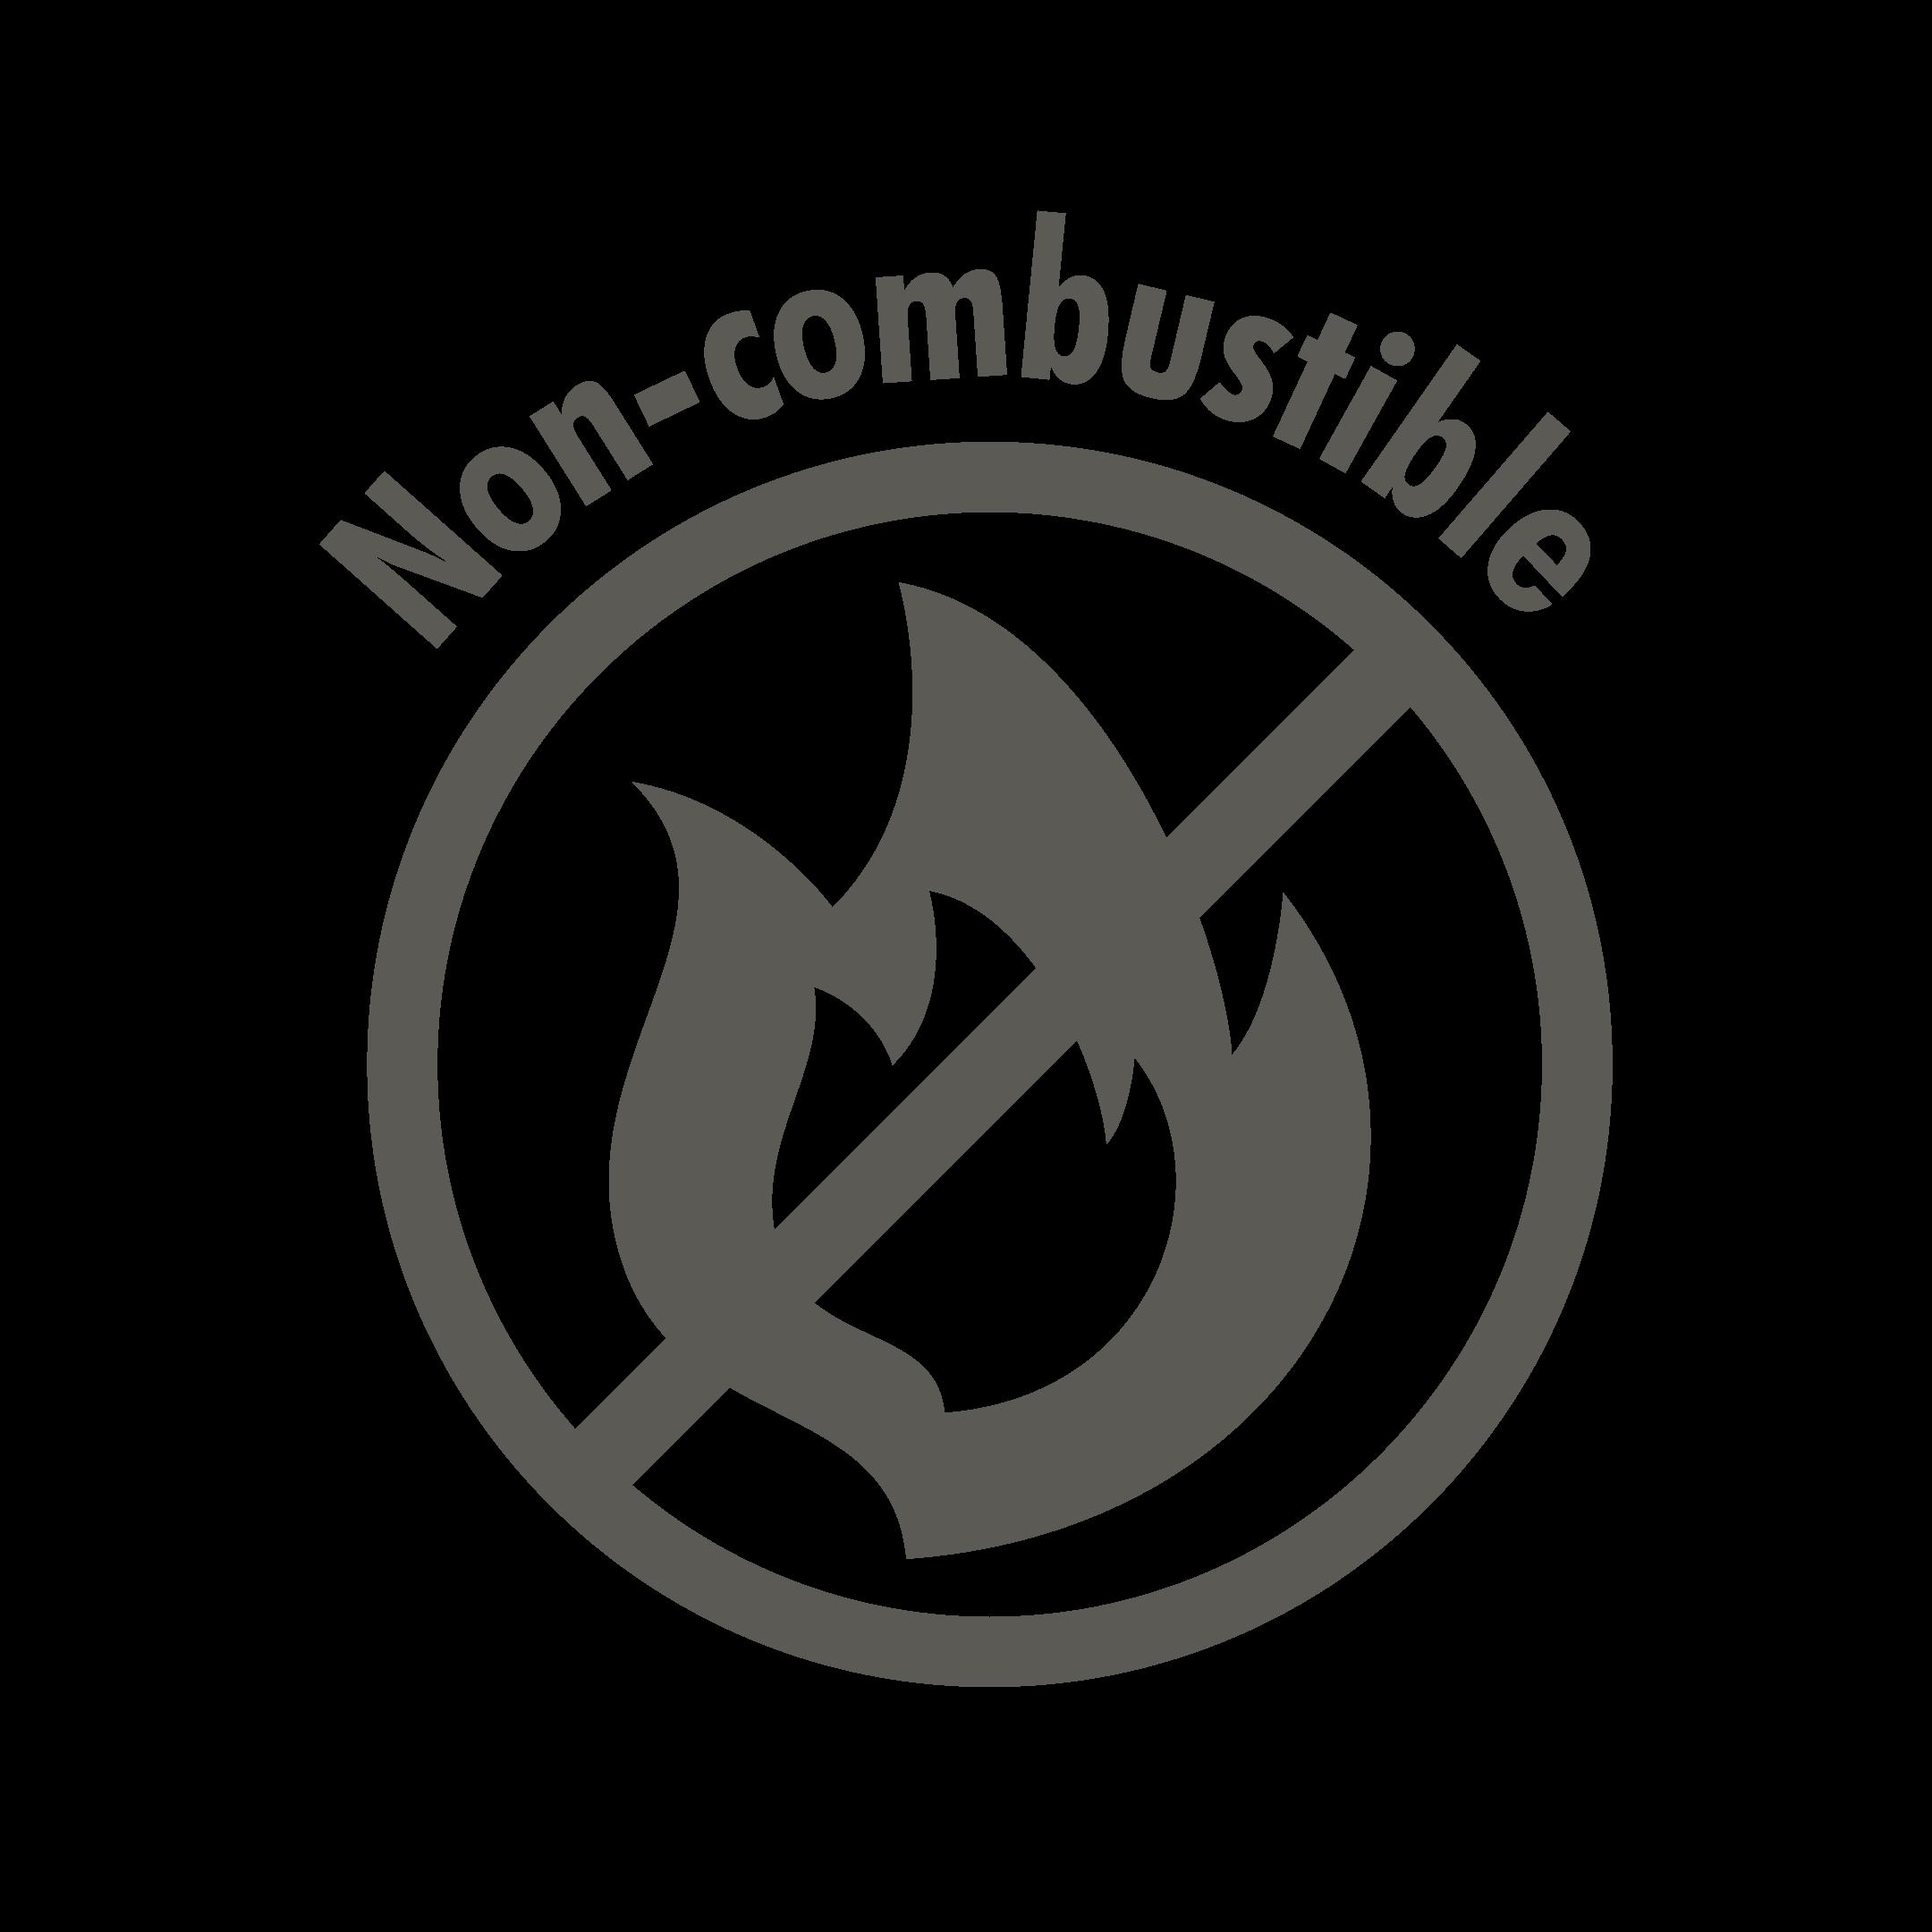 Non-combustible Icon